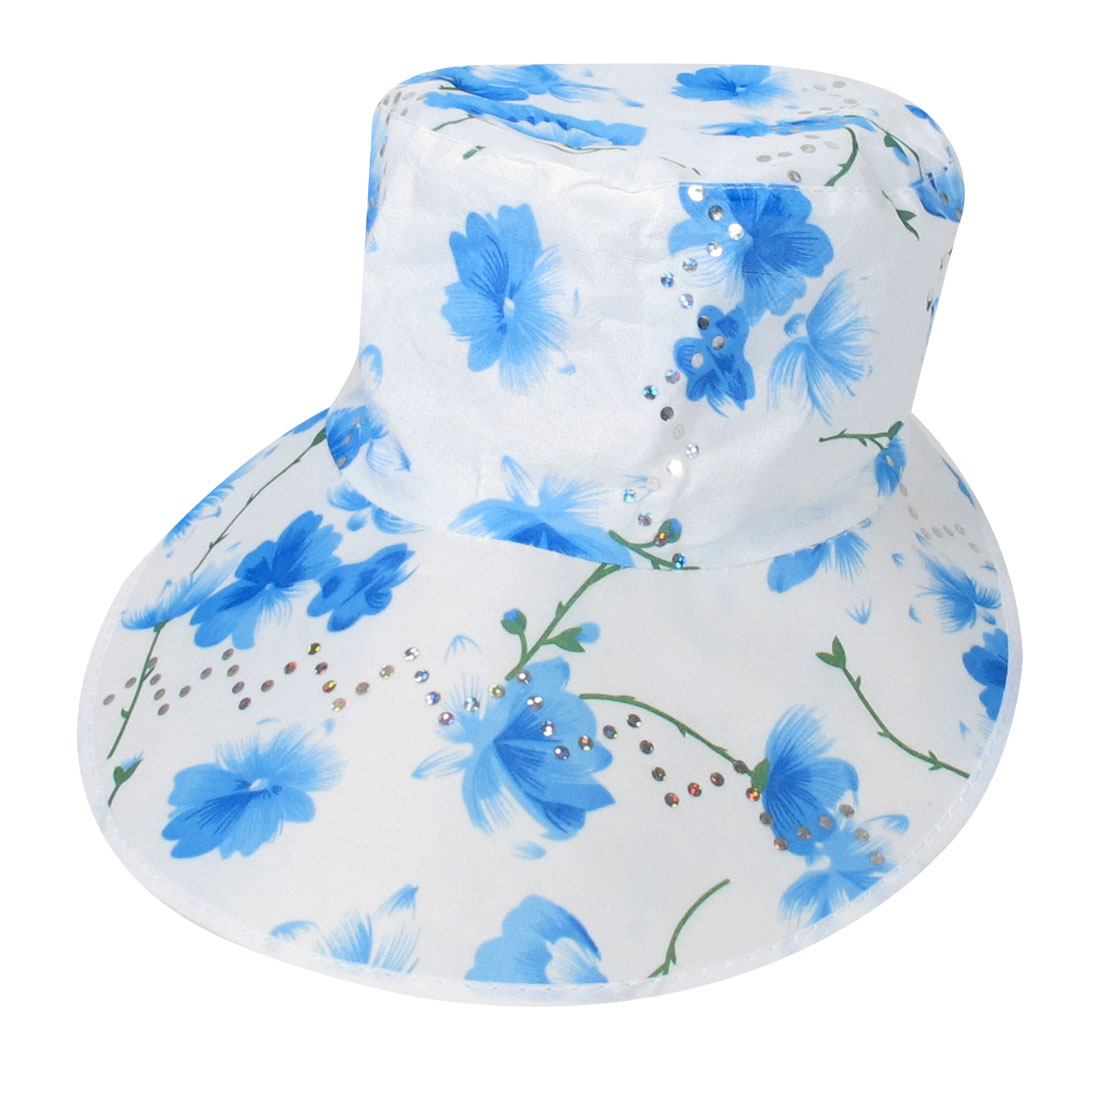 Self Tie Blue White Florals Prints Sequin Wide Visor Beach Hat Cap for Women